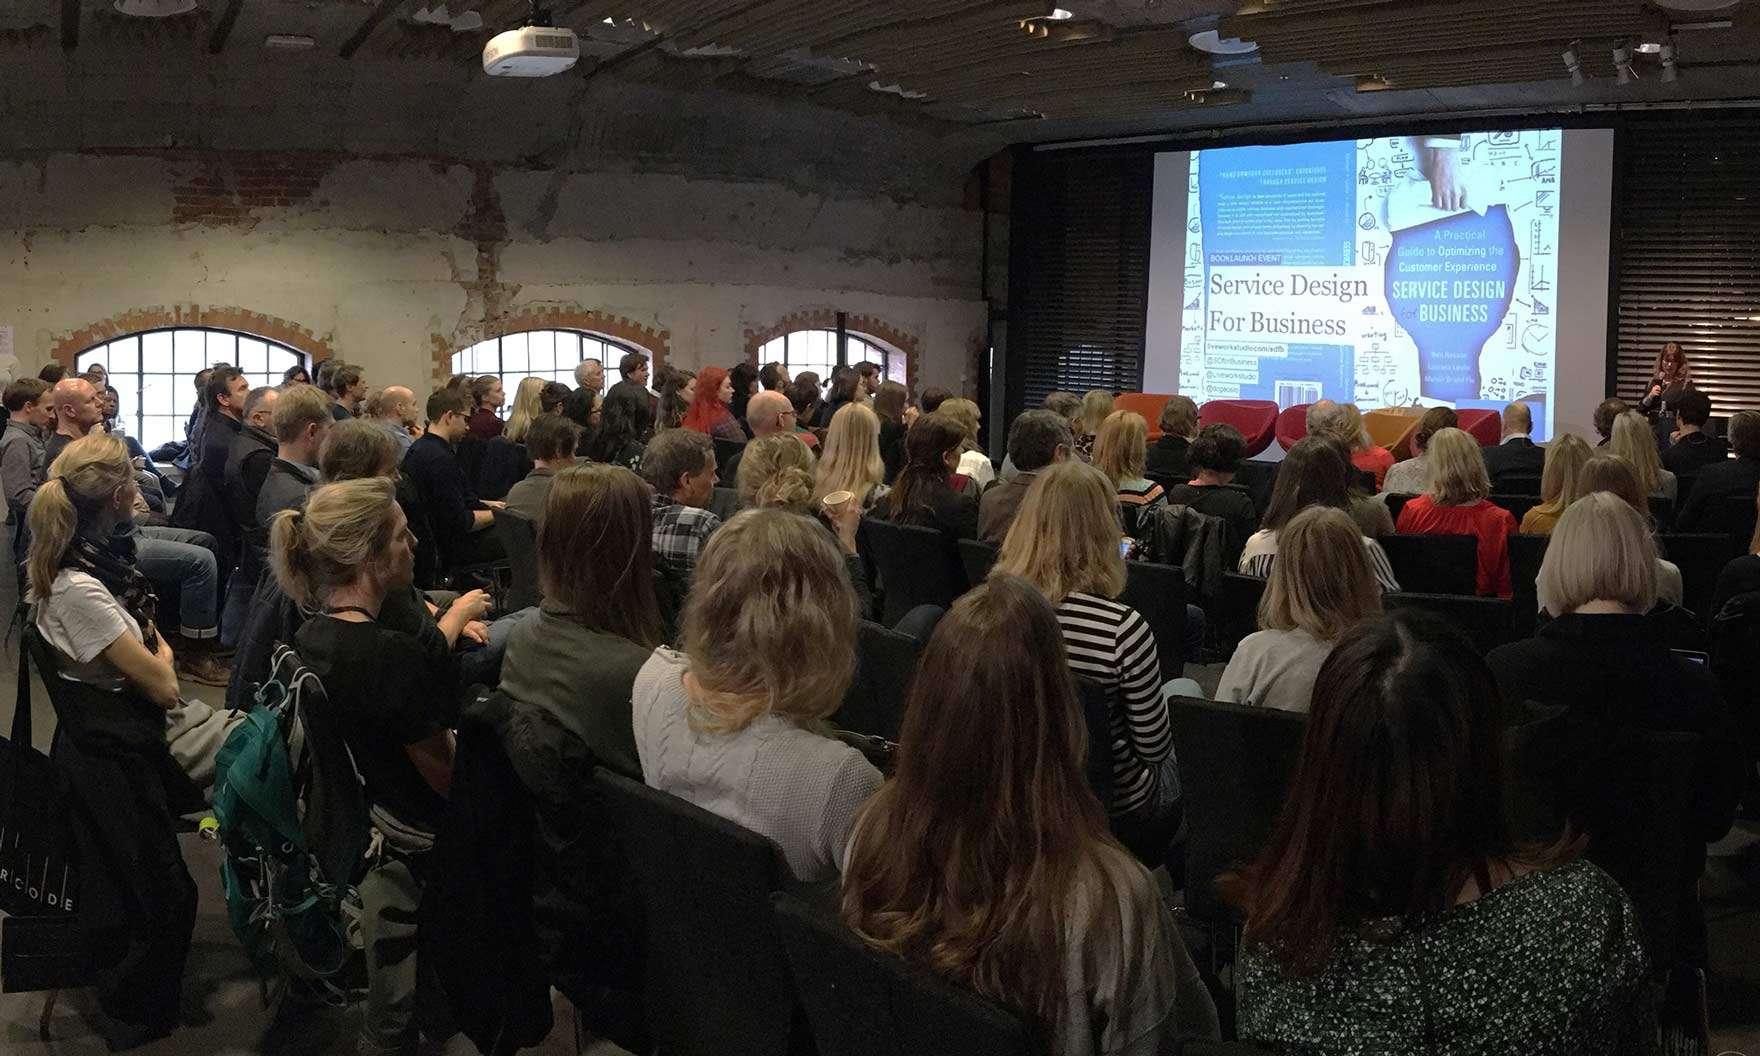 Service Design for Business book launch, DogA - Norwegian Centre for Design and Architecture, Oslo